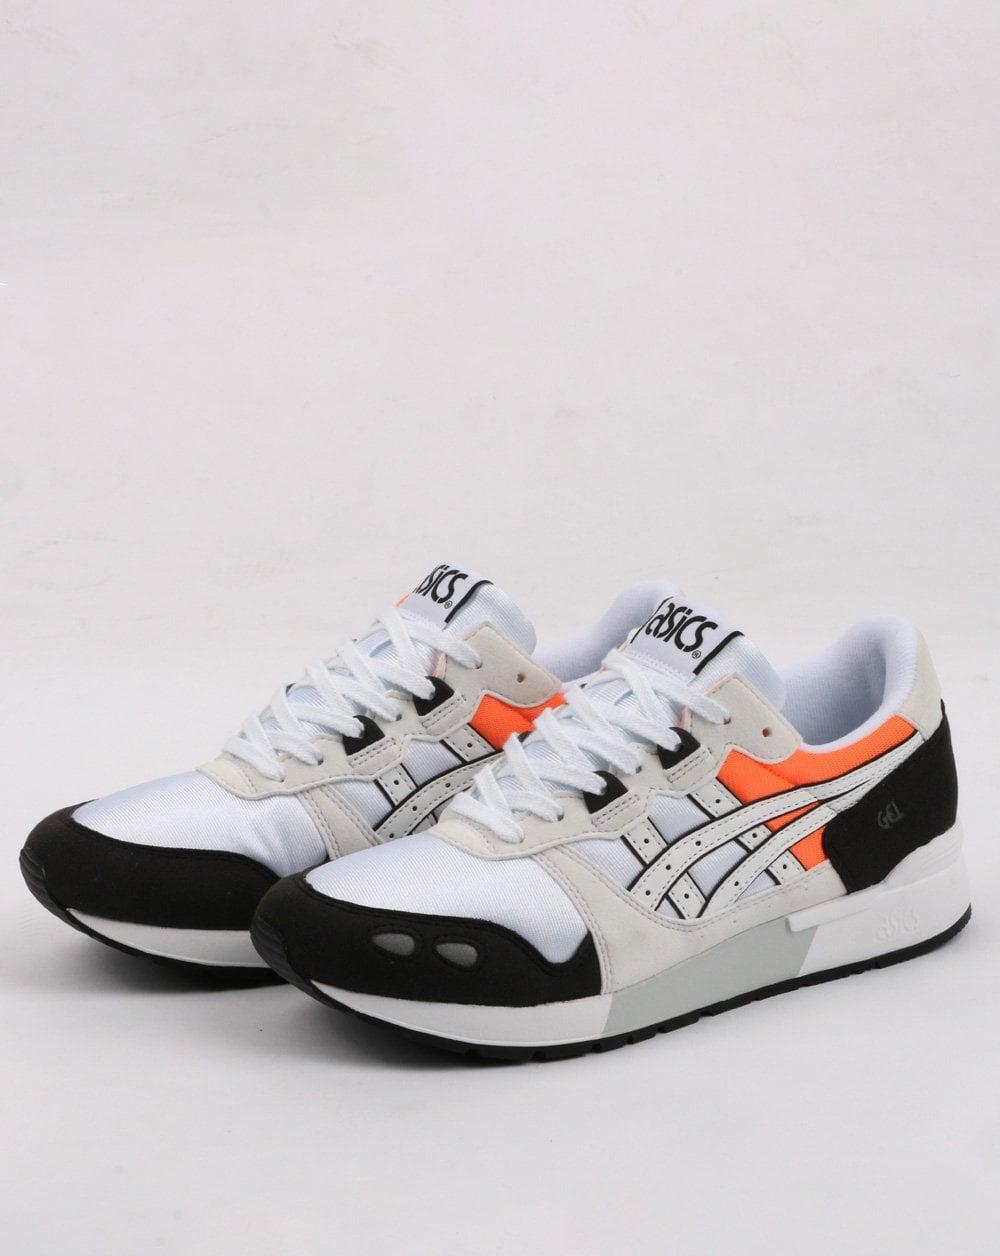 Asics Gel-lyte Trainers White/orange